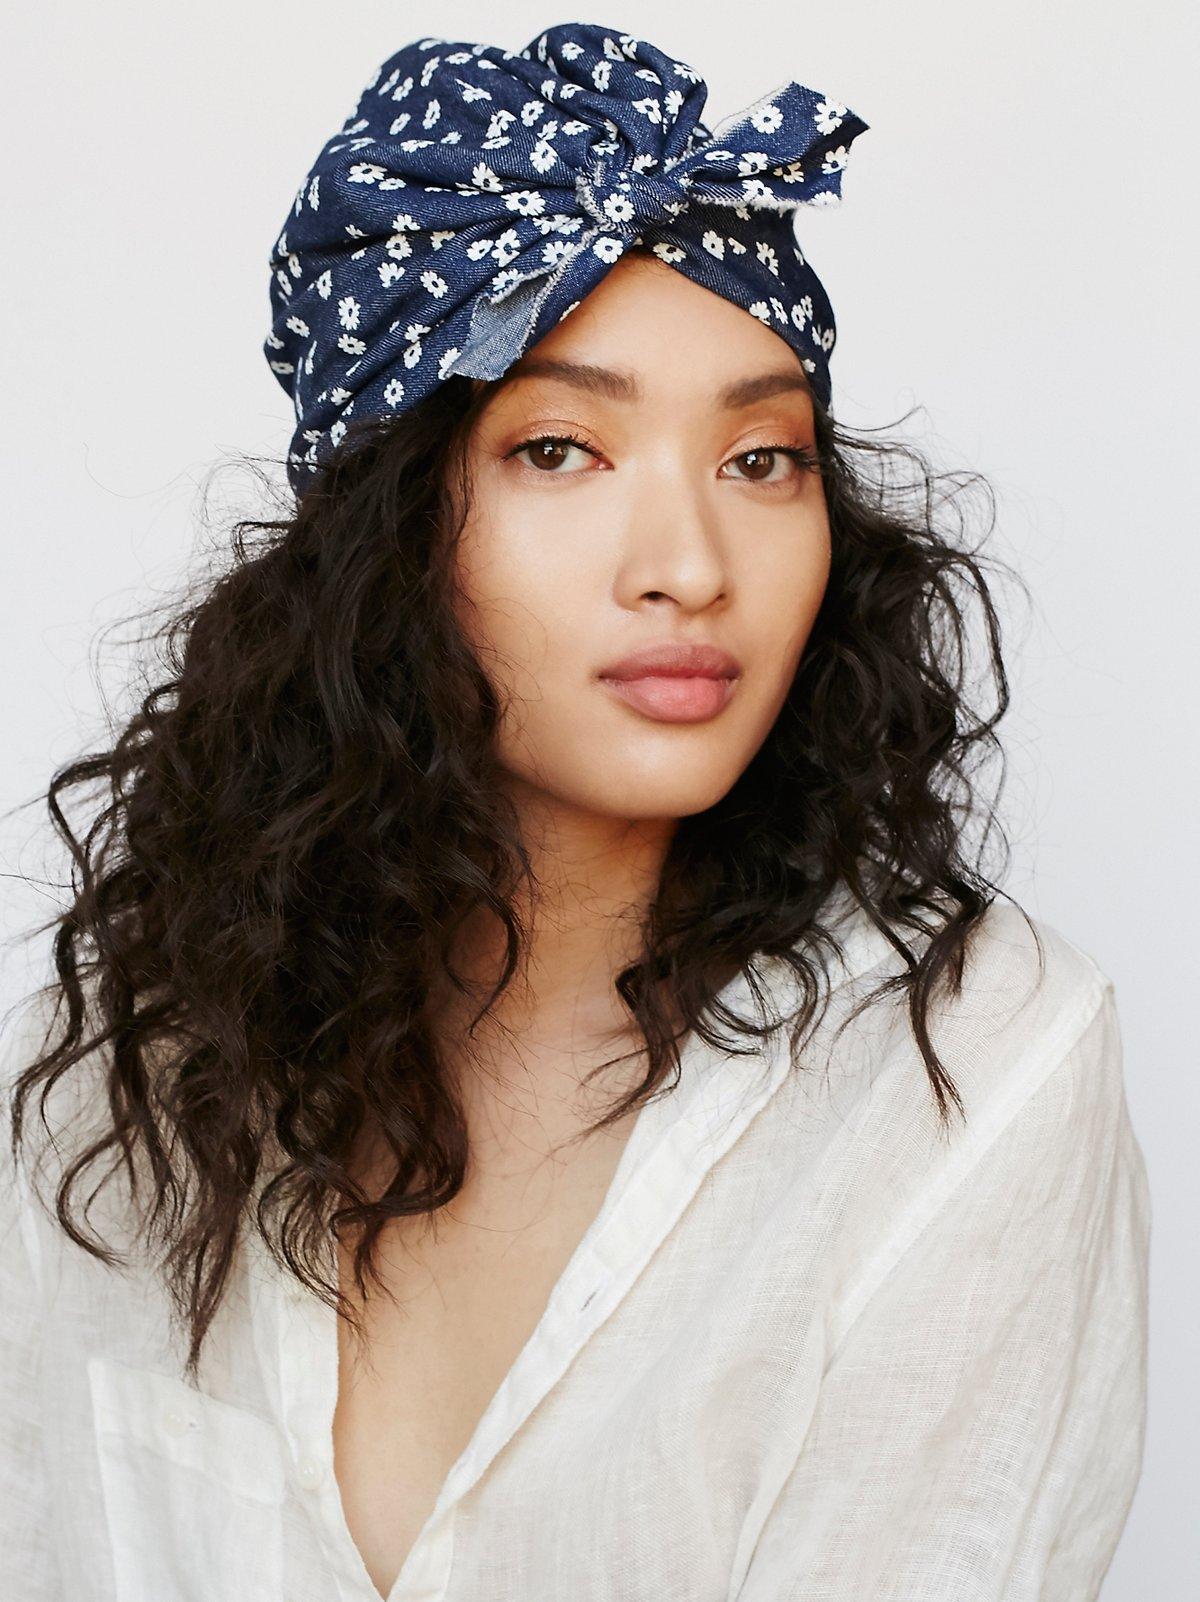 Riviera头巾